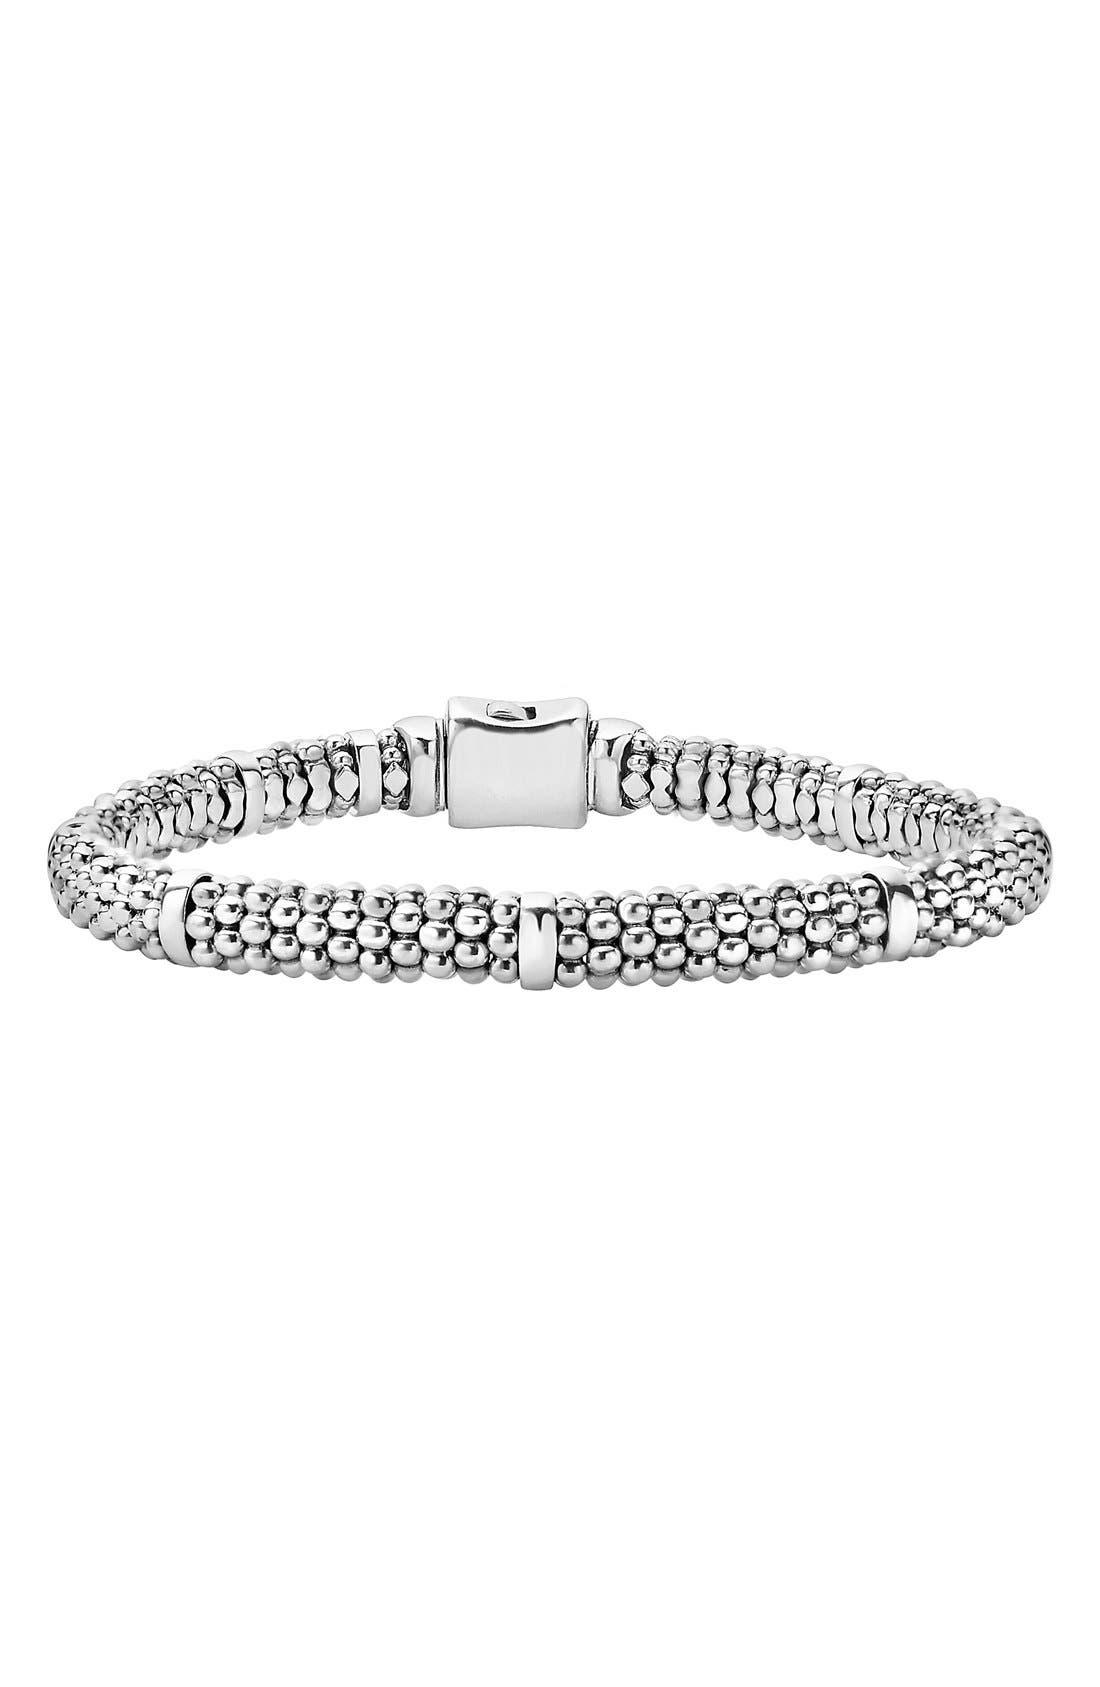 Main Image - LAGOS Caviar Rope Station Bracelet